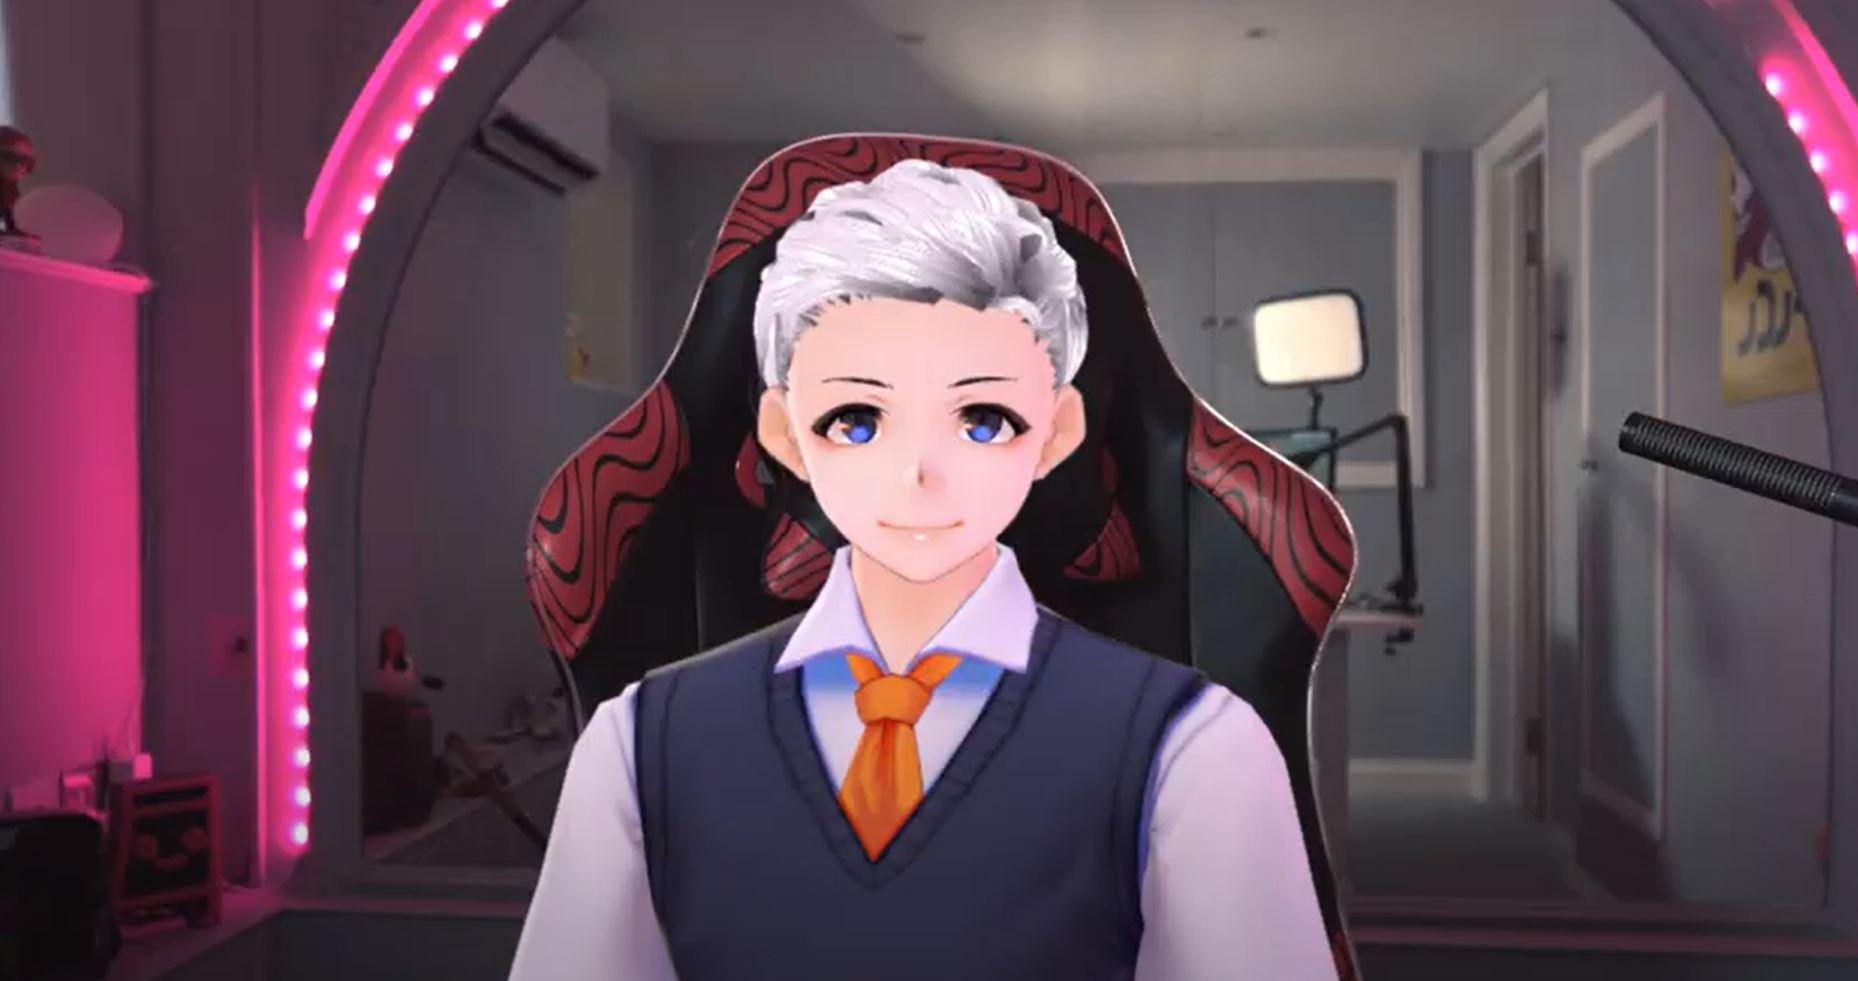 PewDiePie's second anime avatar.